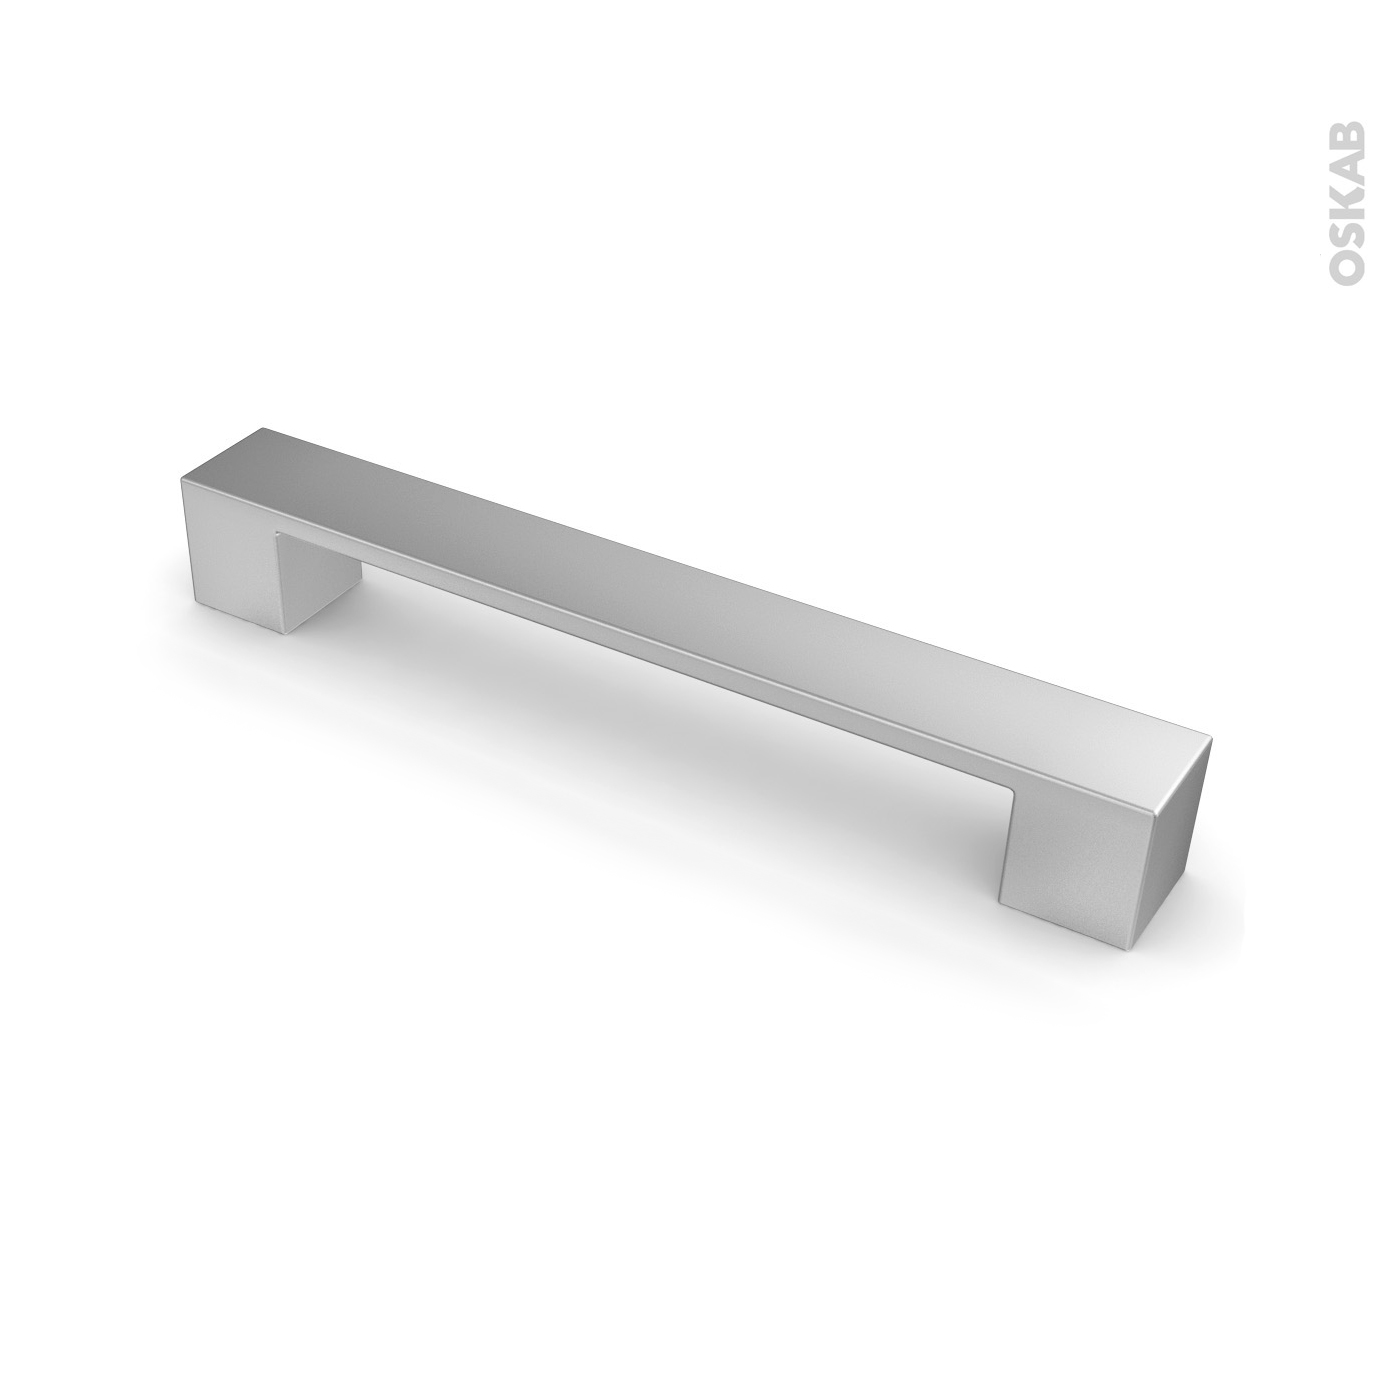 Poignee Porte Placard Cuisine poignée de meuble de cuisine n°4 vernis alu mat, 19,5 cm, entraxe 160 mm,  sokleo